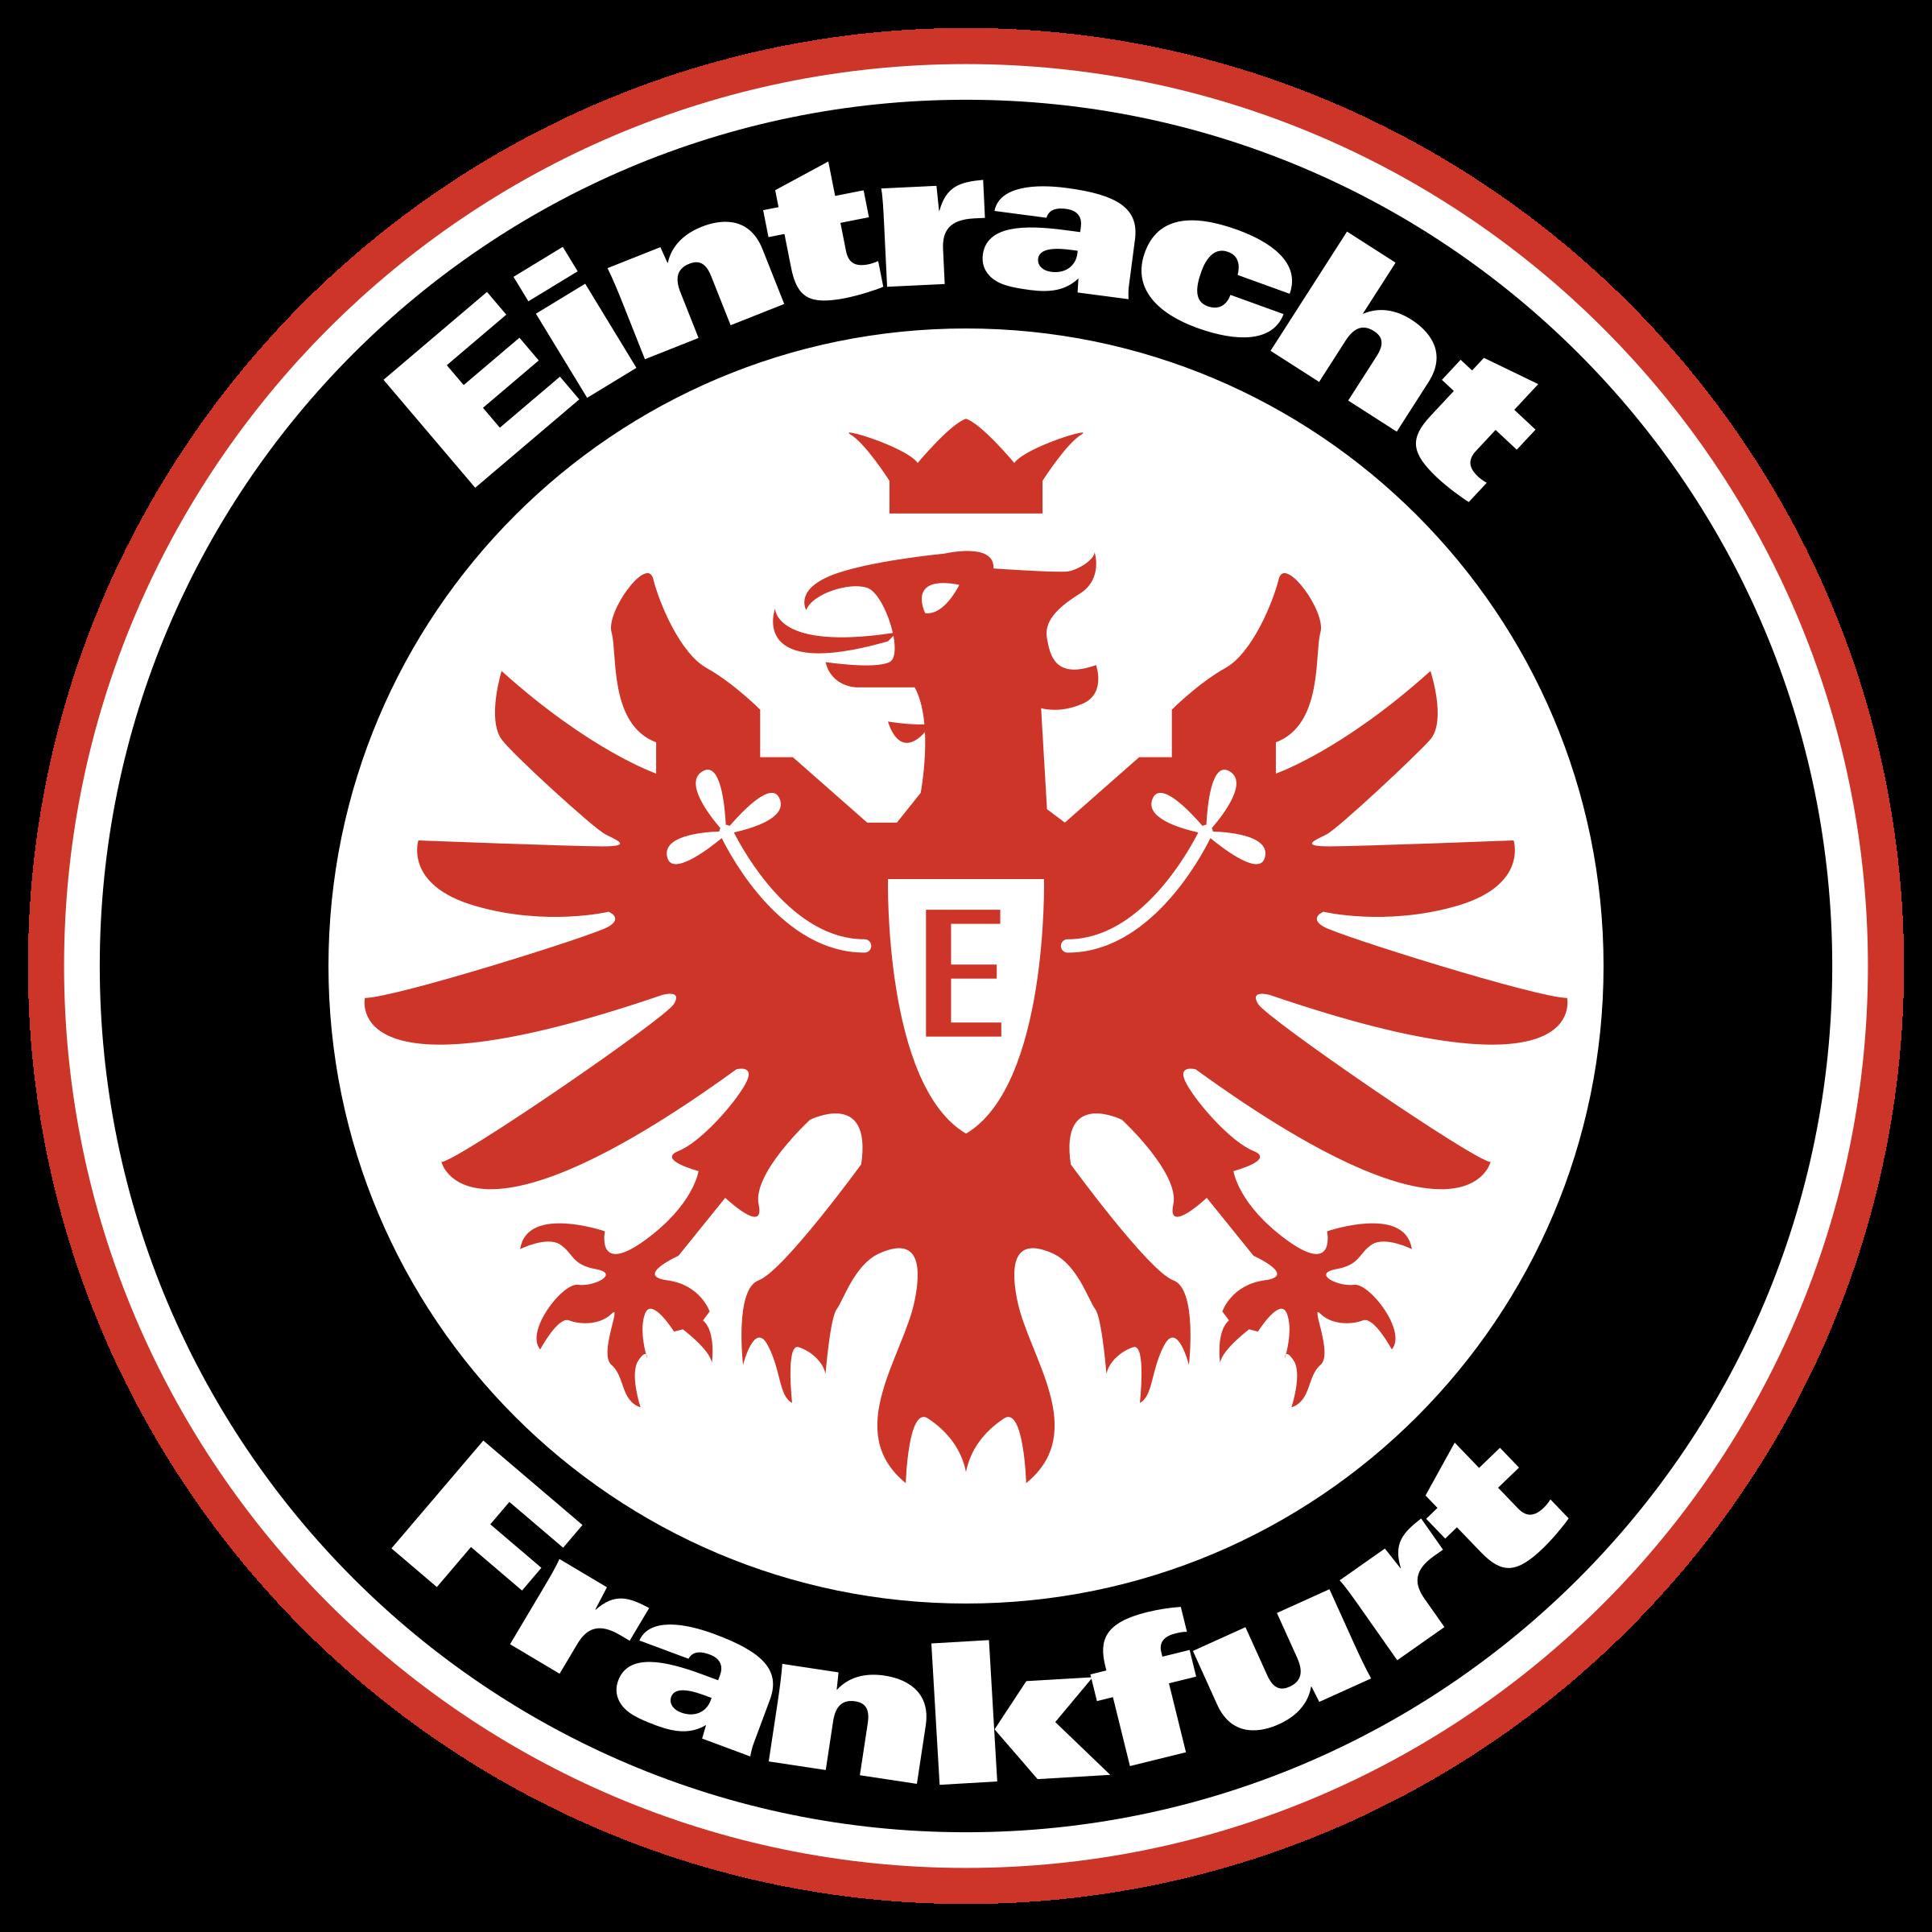 Sv Eintracht Trier 05 Vector